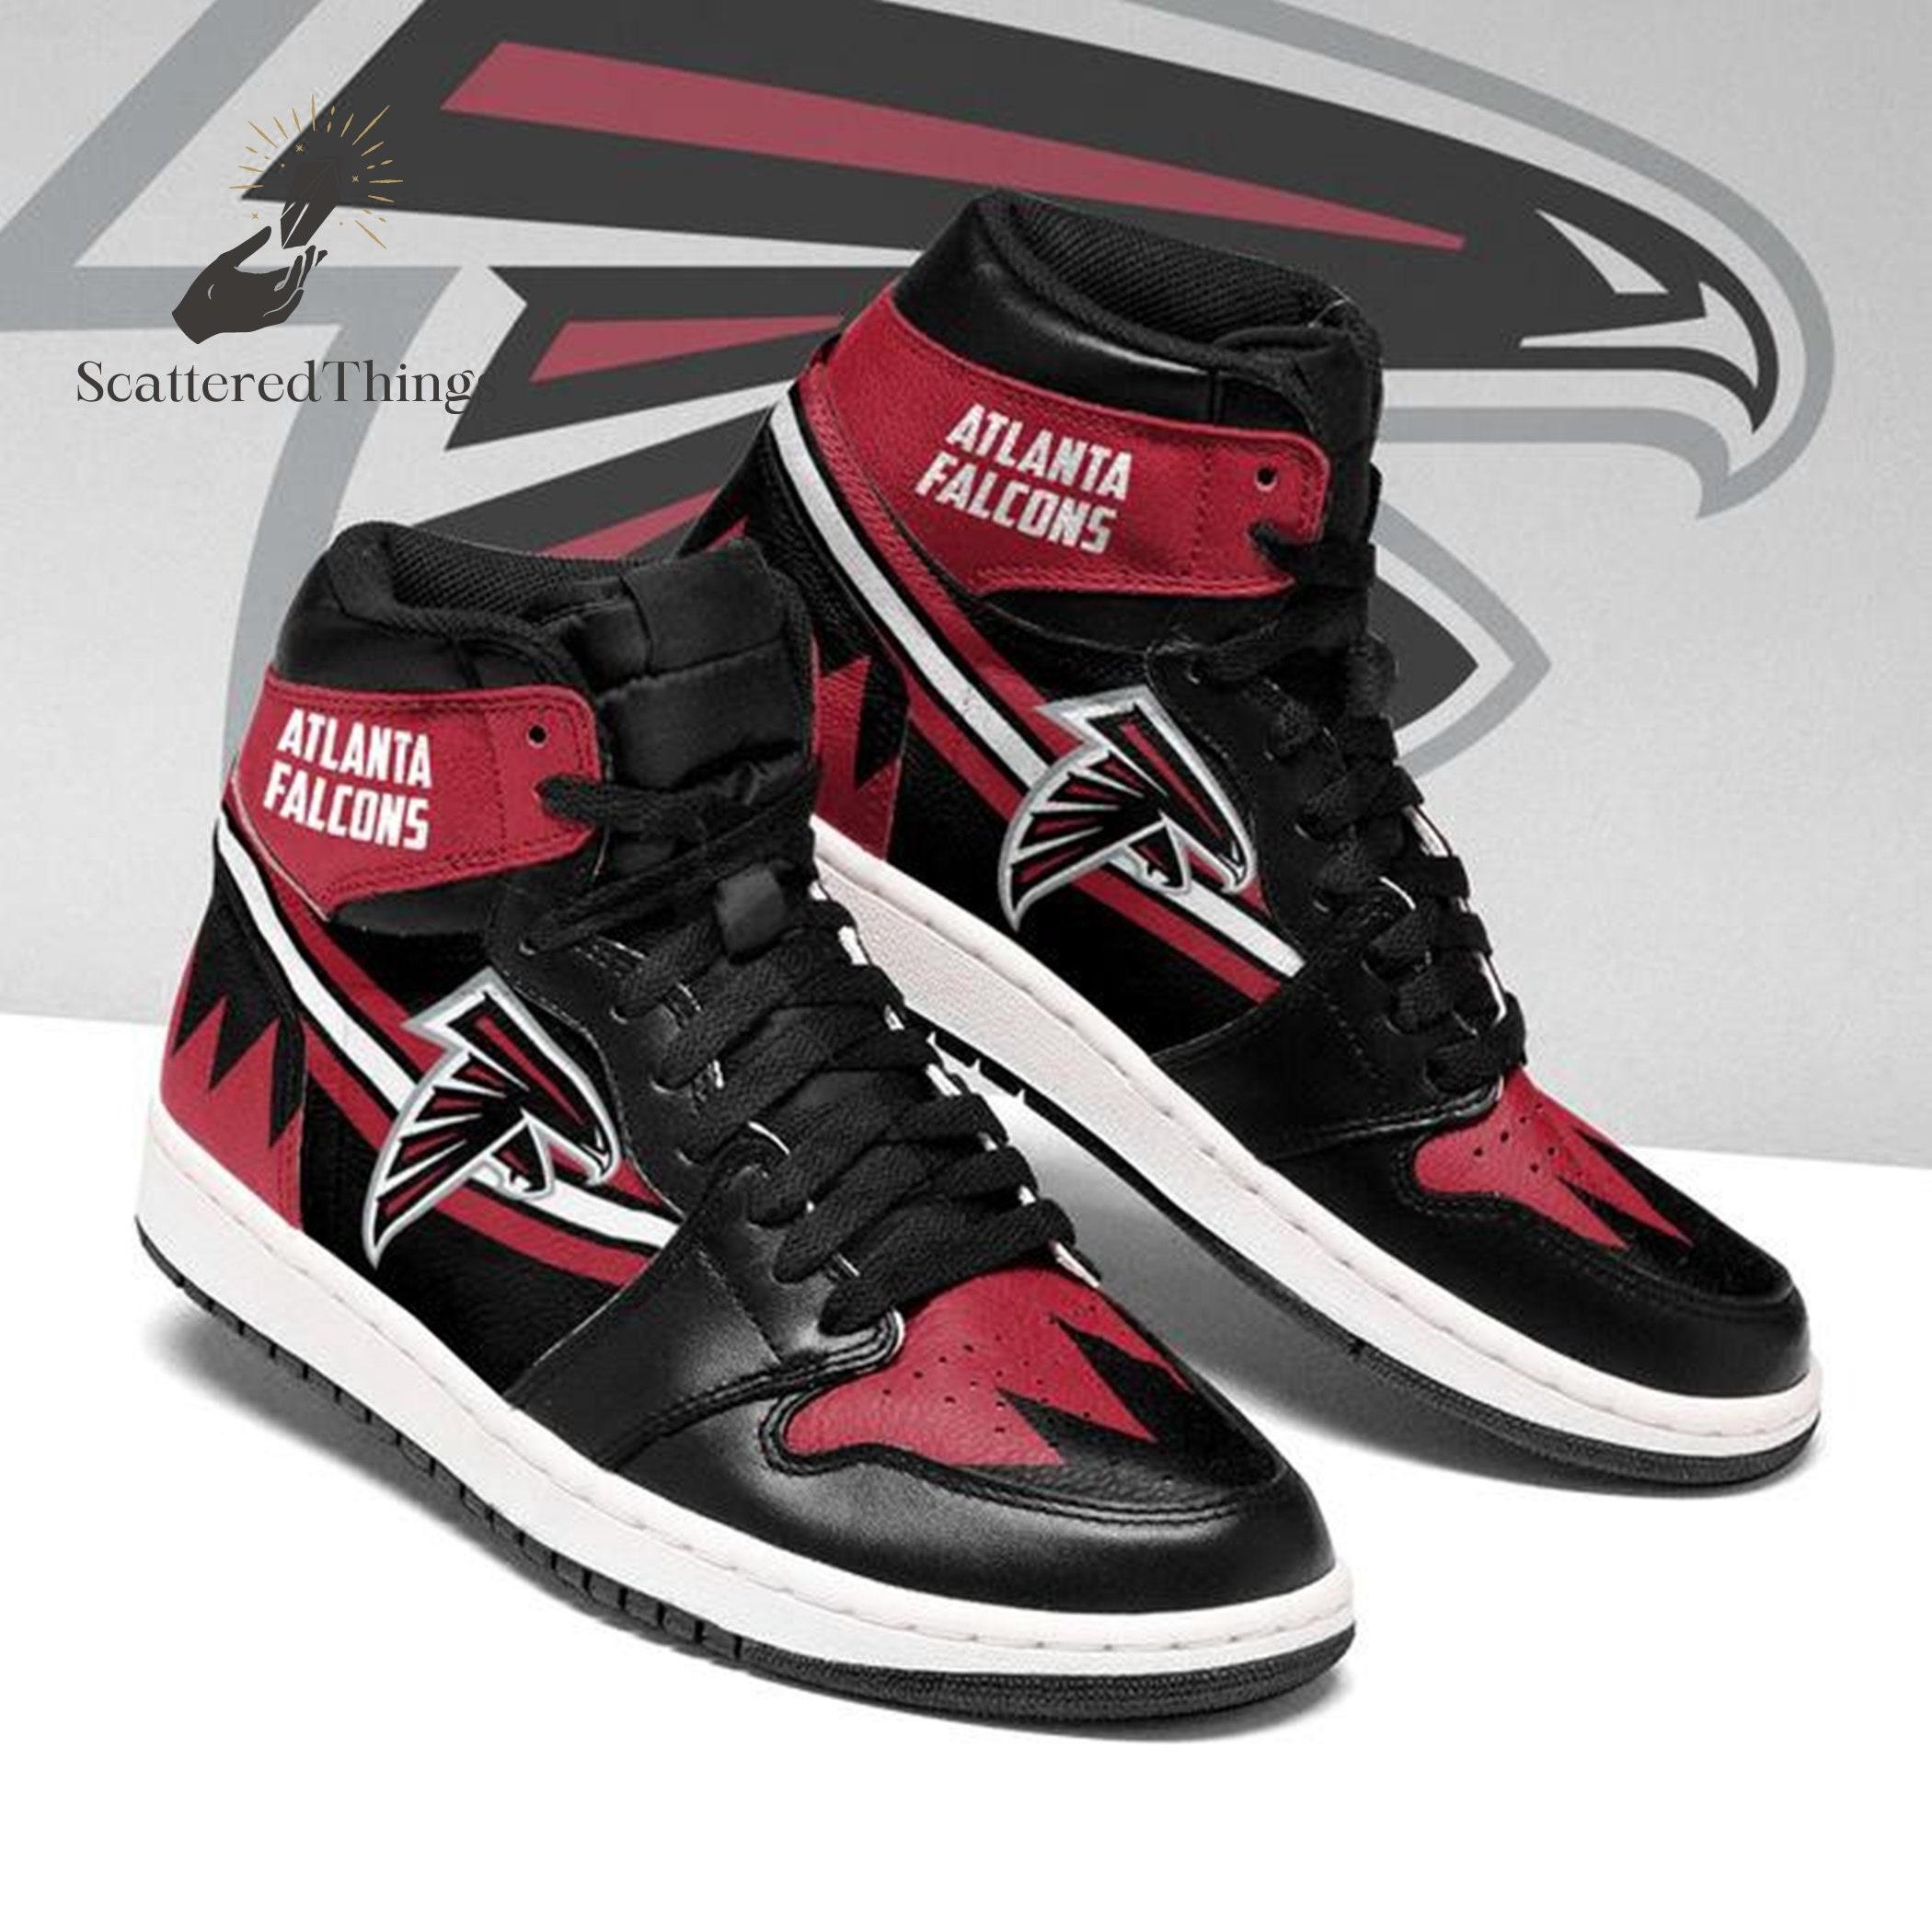 Atlanta Air Jordan Shoes Falcons Air Jordan Canvas Shoes Air Jordan Sneakers Running Shoes Unisex Shoes Sport Shoes